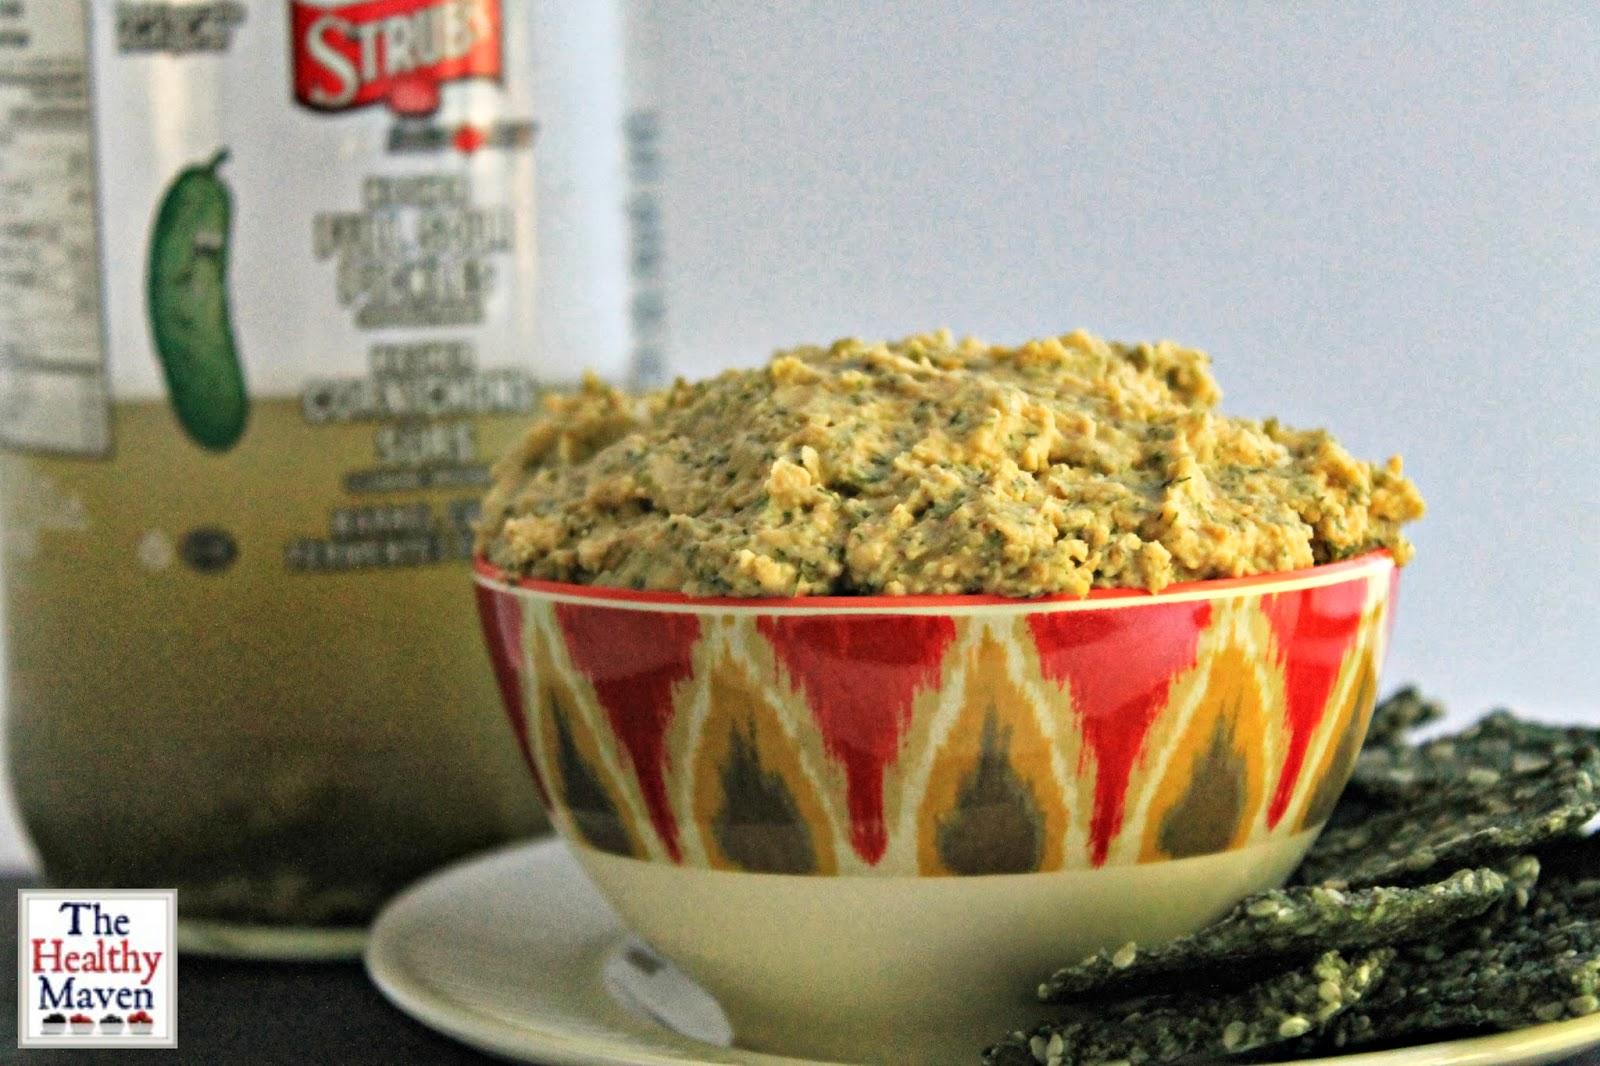 Peanut Butter Dill Pickle Hummus